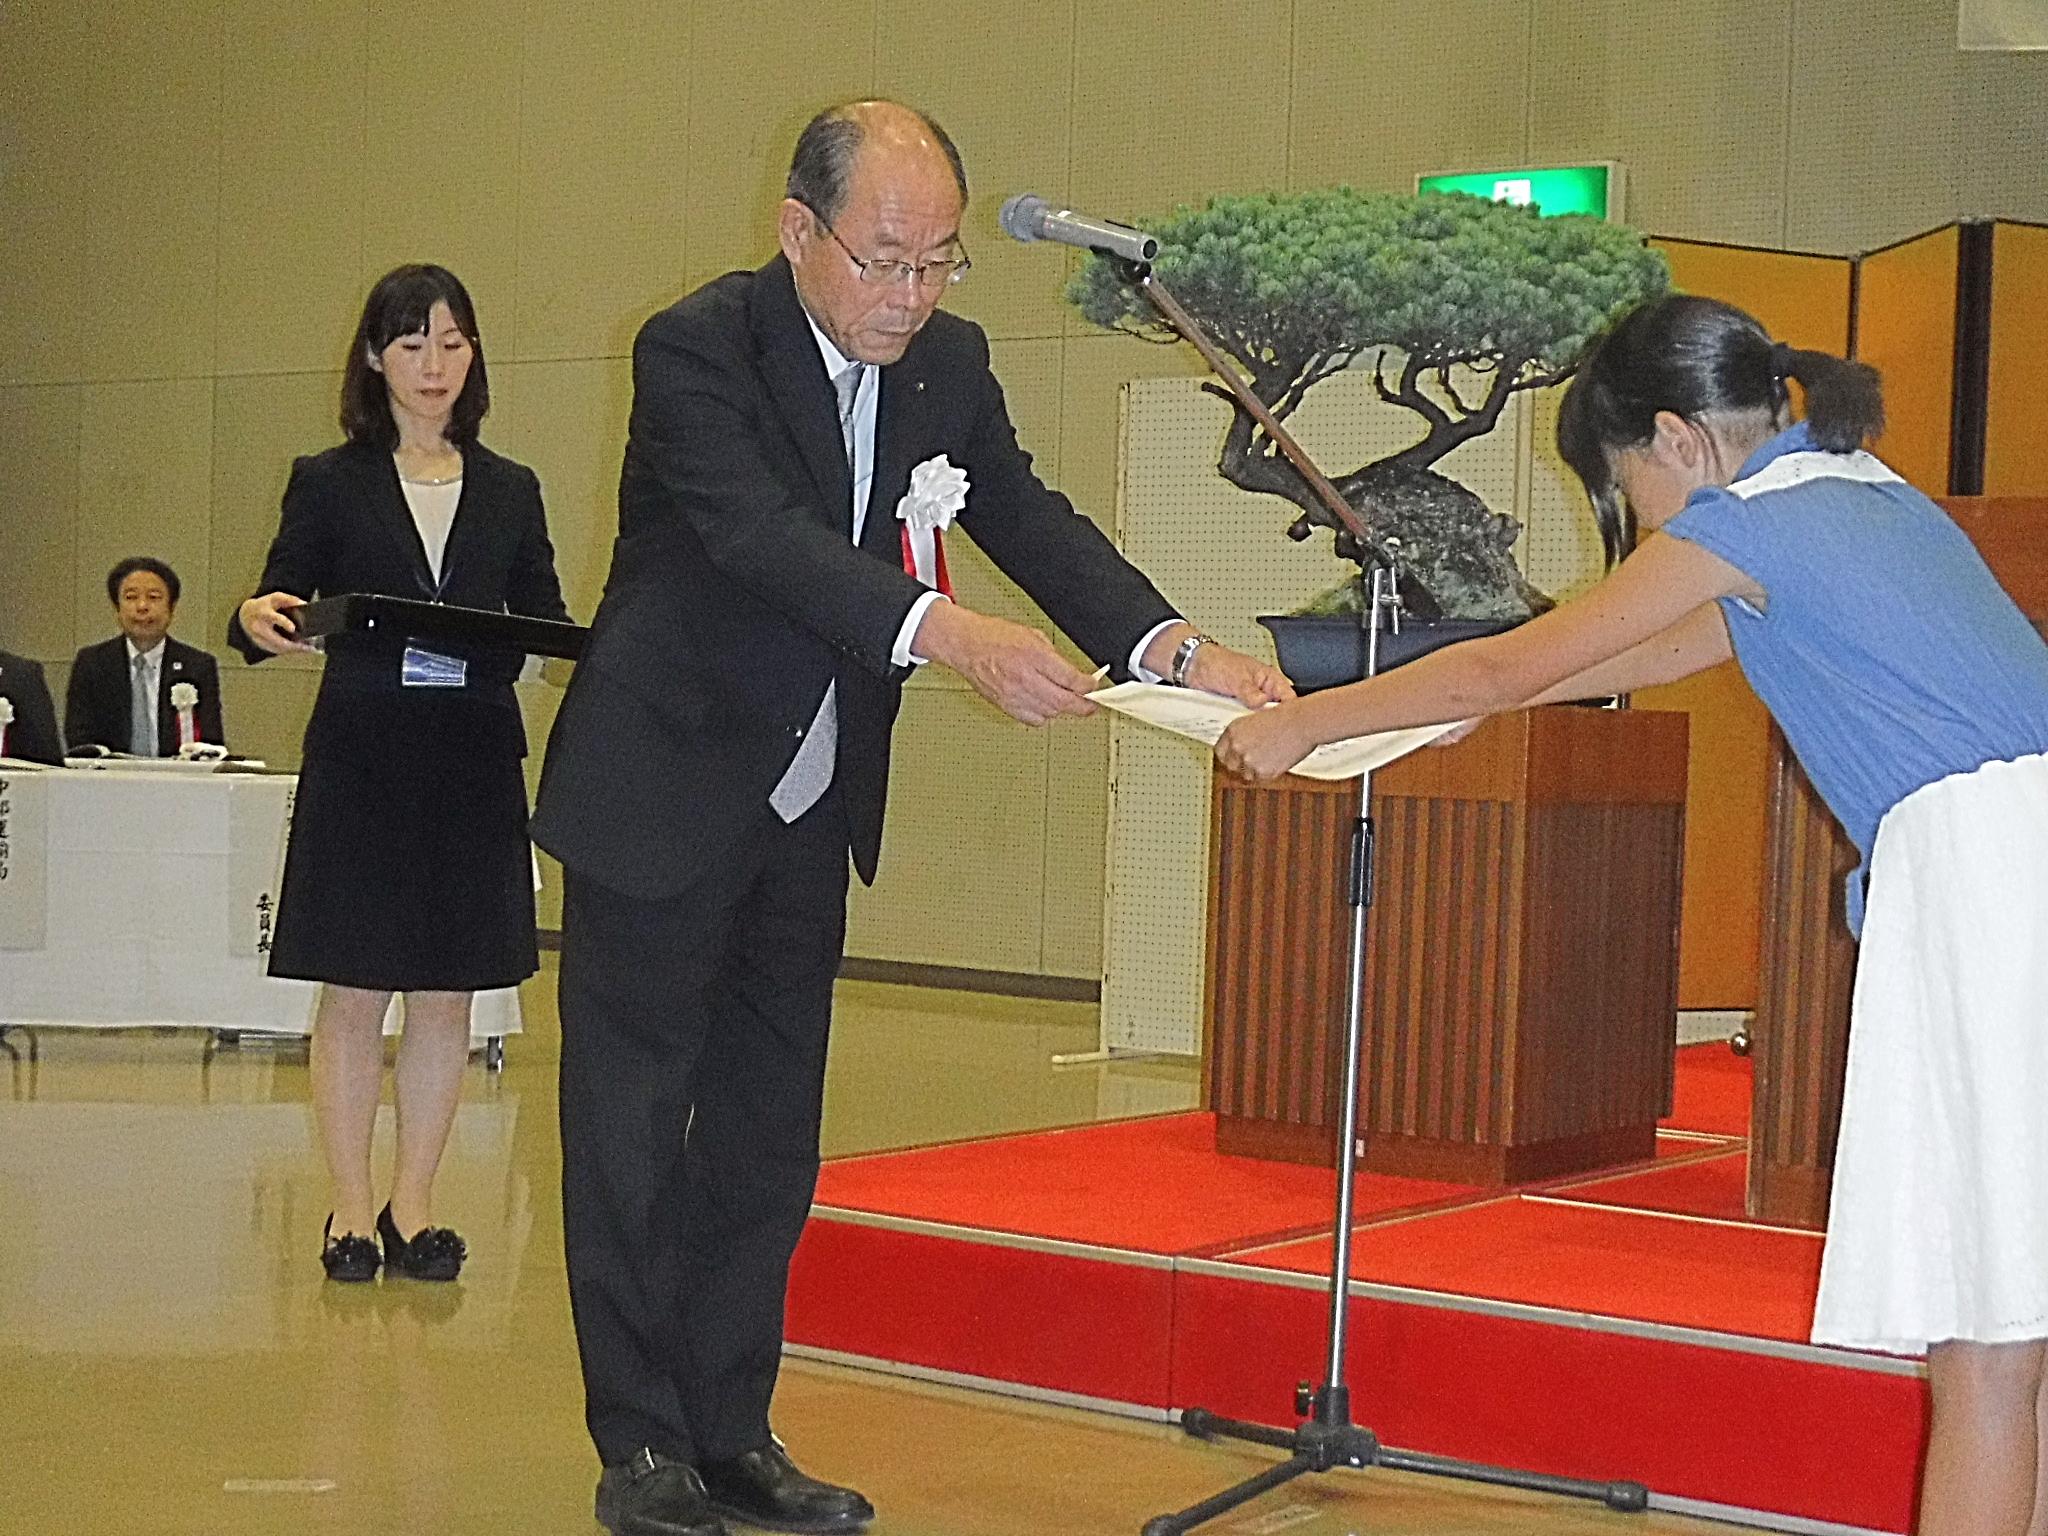 Award of Shimizu Koho Kyokai presented by Mr. Nishio, President of the Shimizu Koho Kyokai